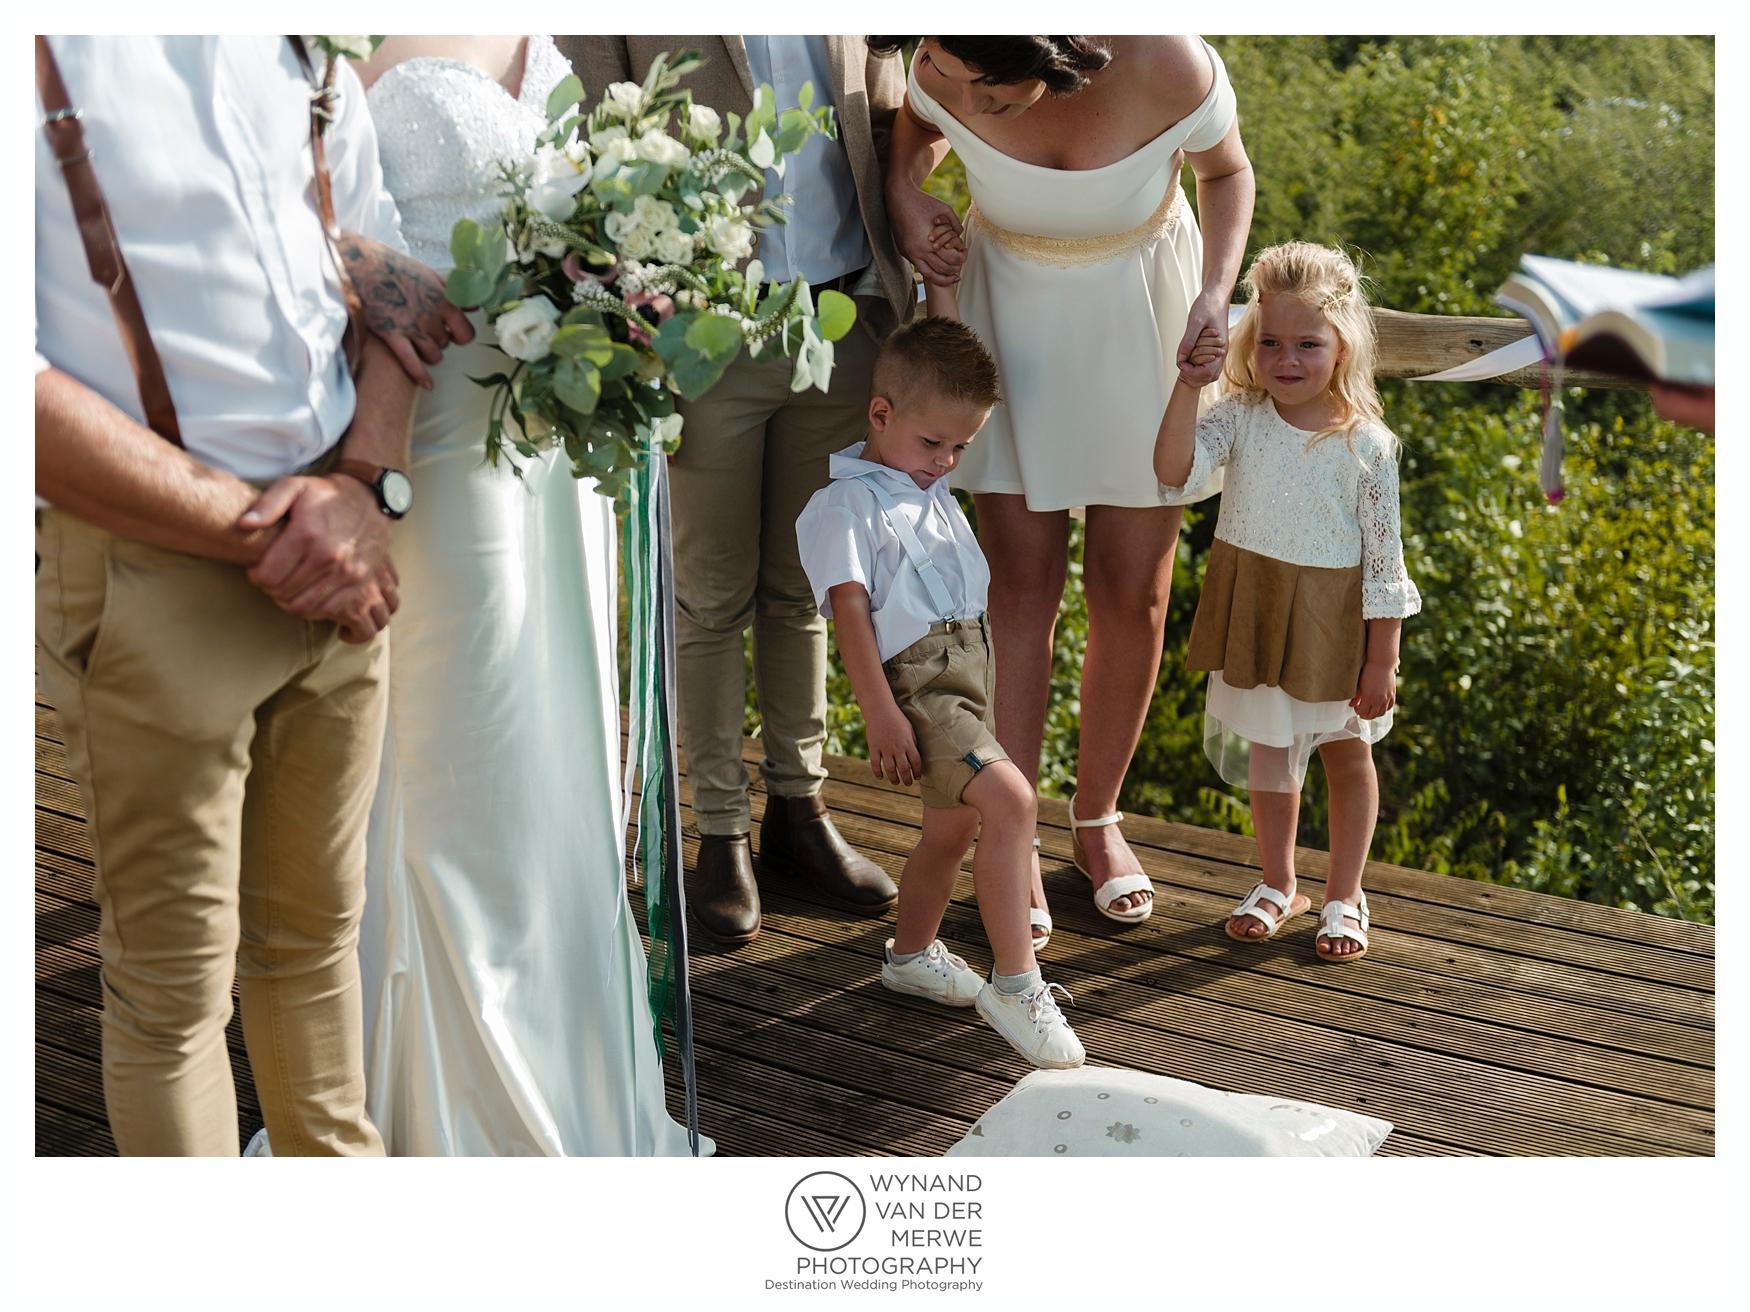 WynandvanderMerwe_weddingphotography_bushveldwedding_northam_bushveld_limpopowedding_limpopo_southafrica-86.jpg